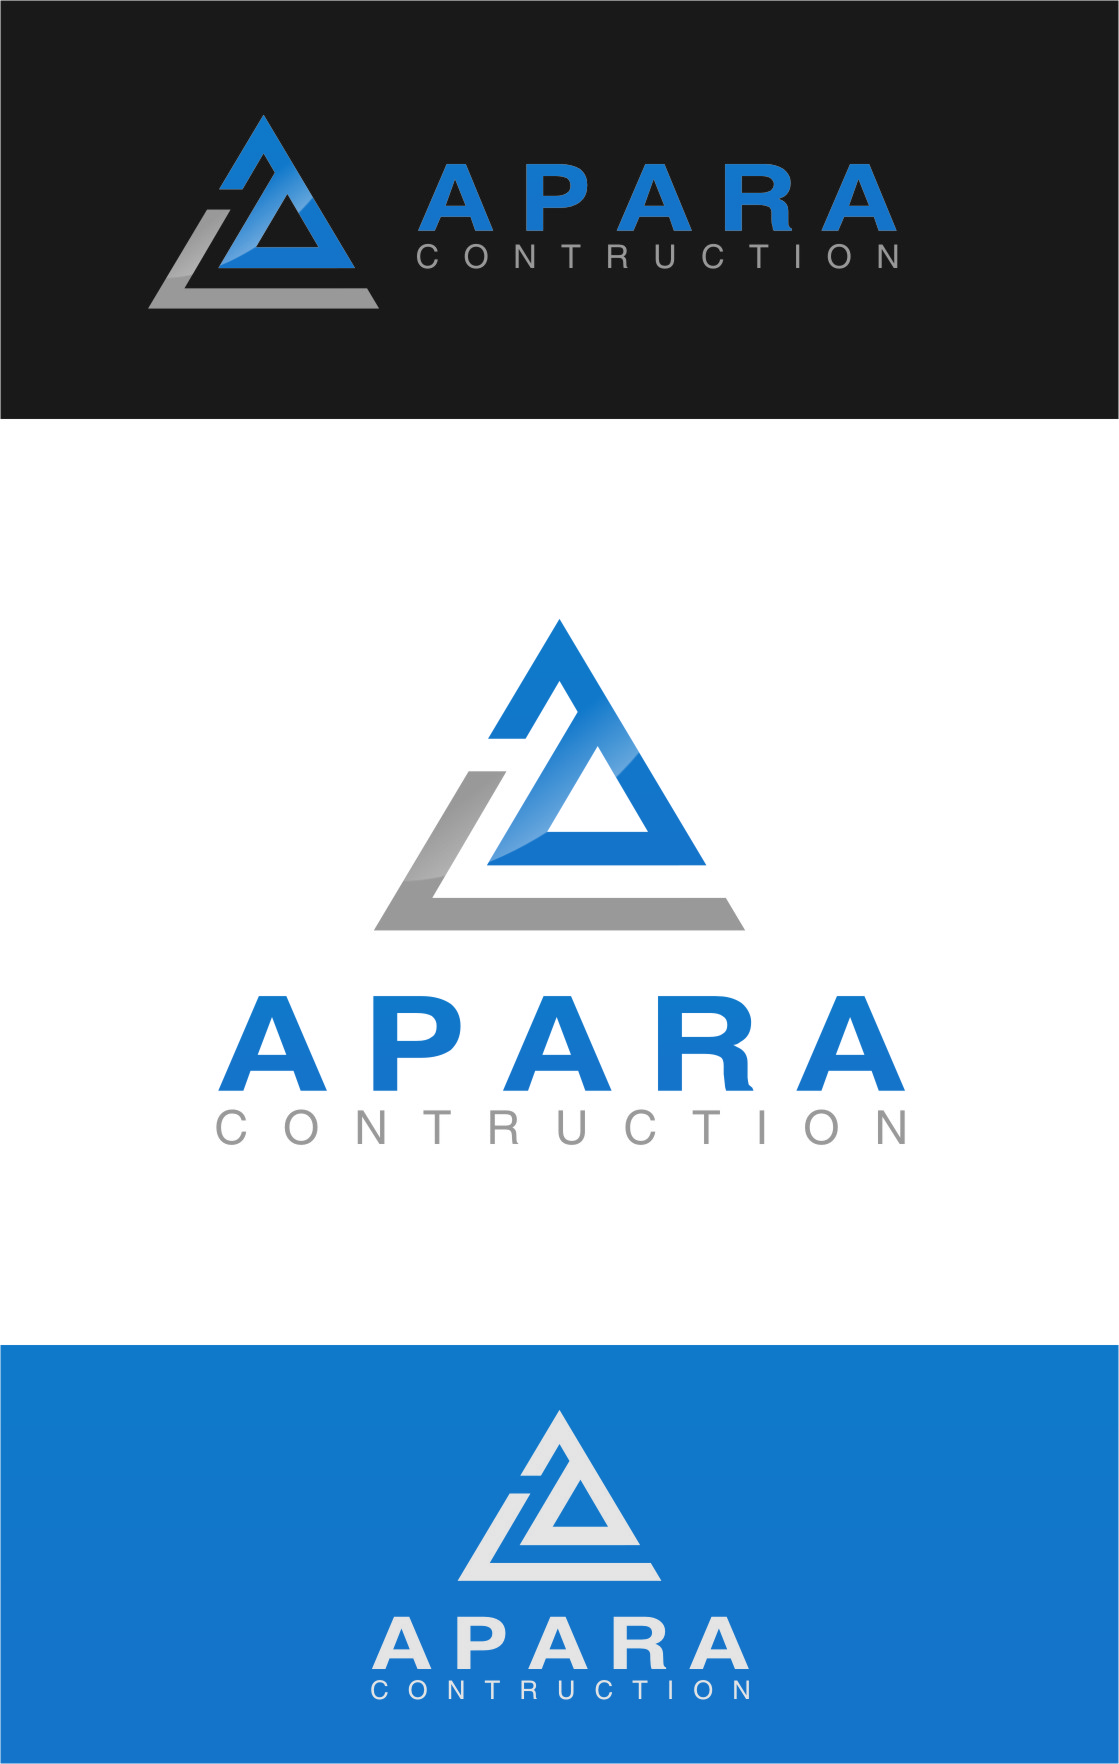 Logo Design by Ngepet_art - Entry No. 61 in the Logo Design Contest Apara Construction Logo Design.